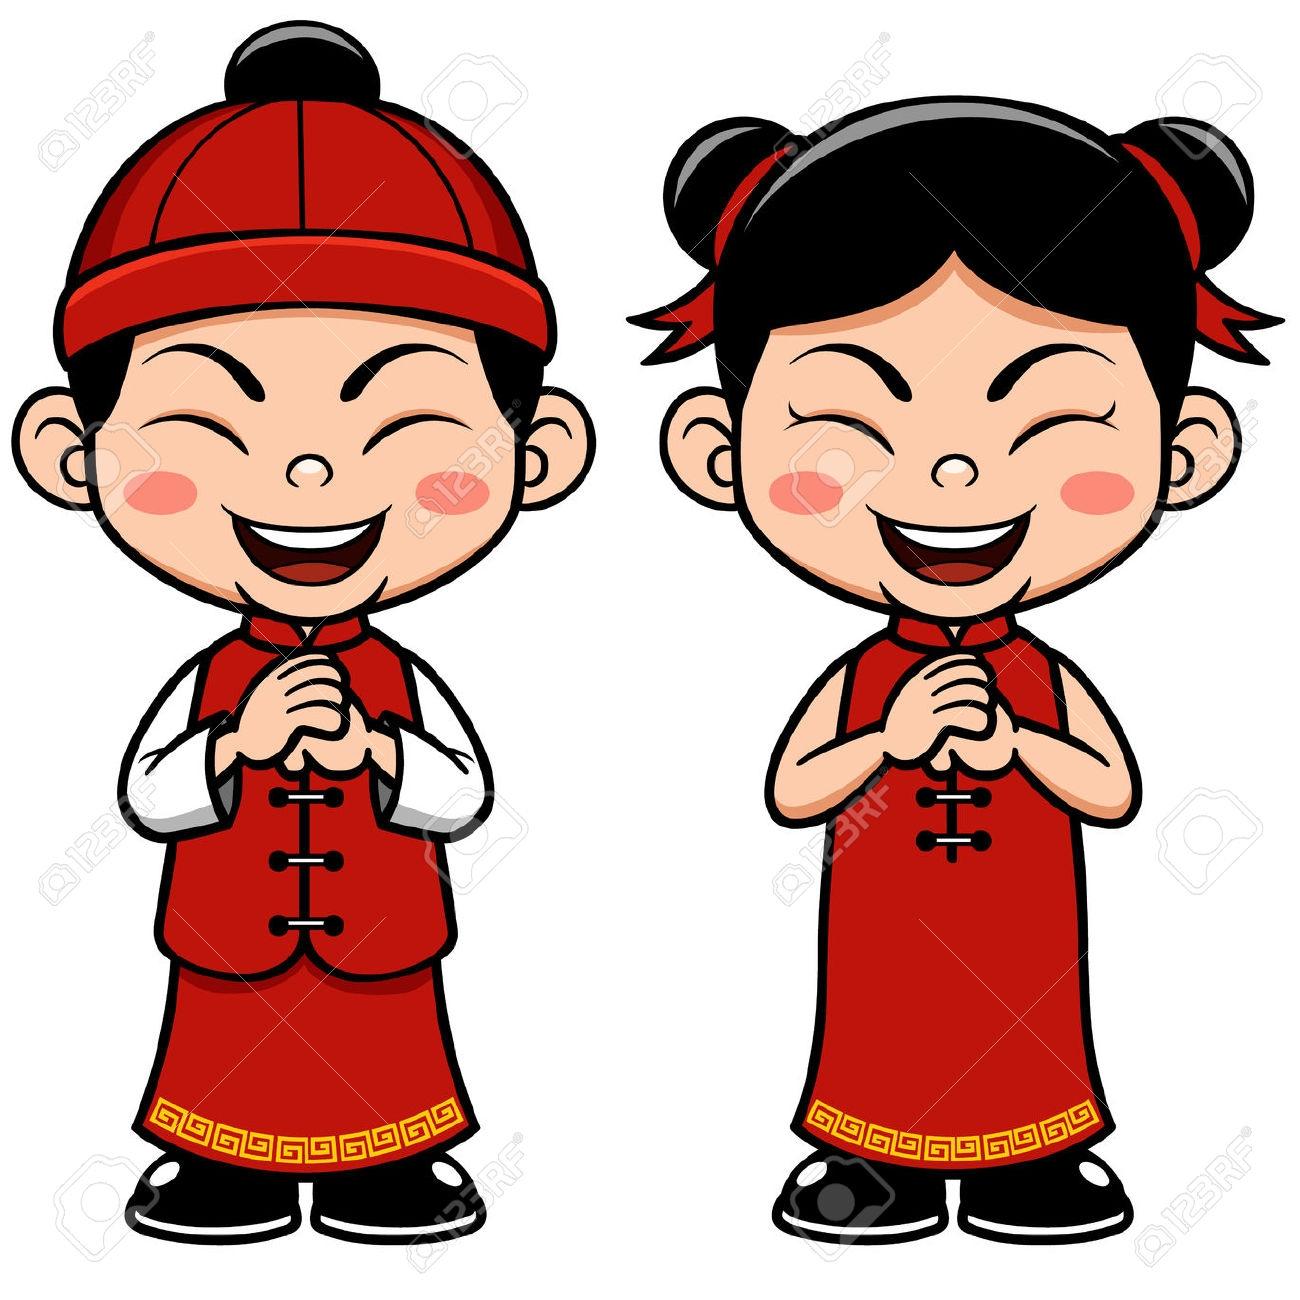 Chinese new year 2015 clipart jpg black and white stock Chinese New Year Clipart | Free download best Chinese New Year ... jpg black and white stock